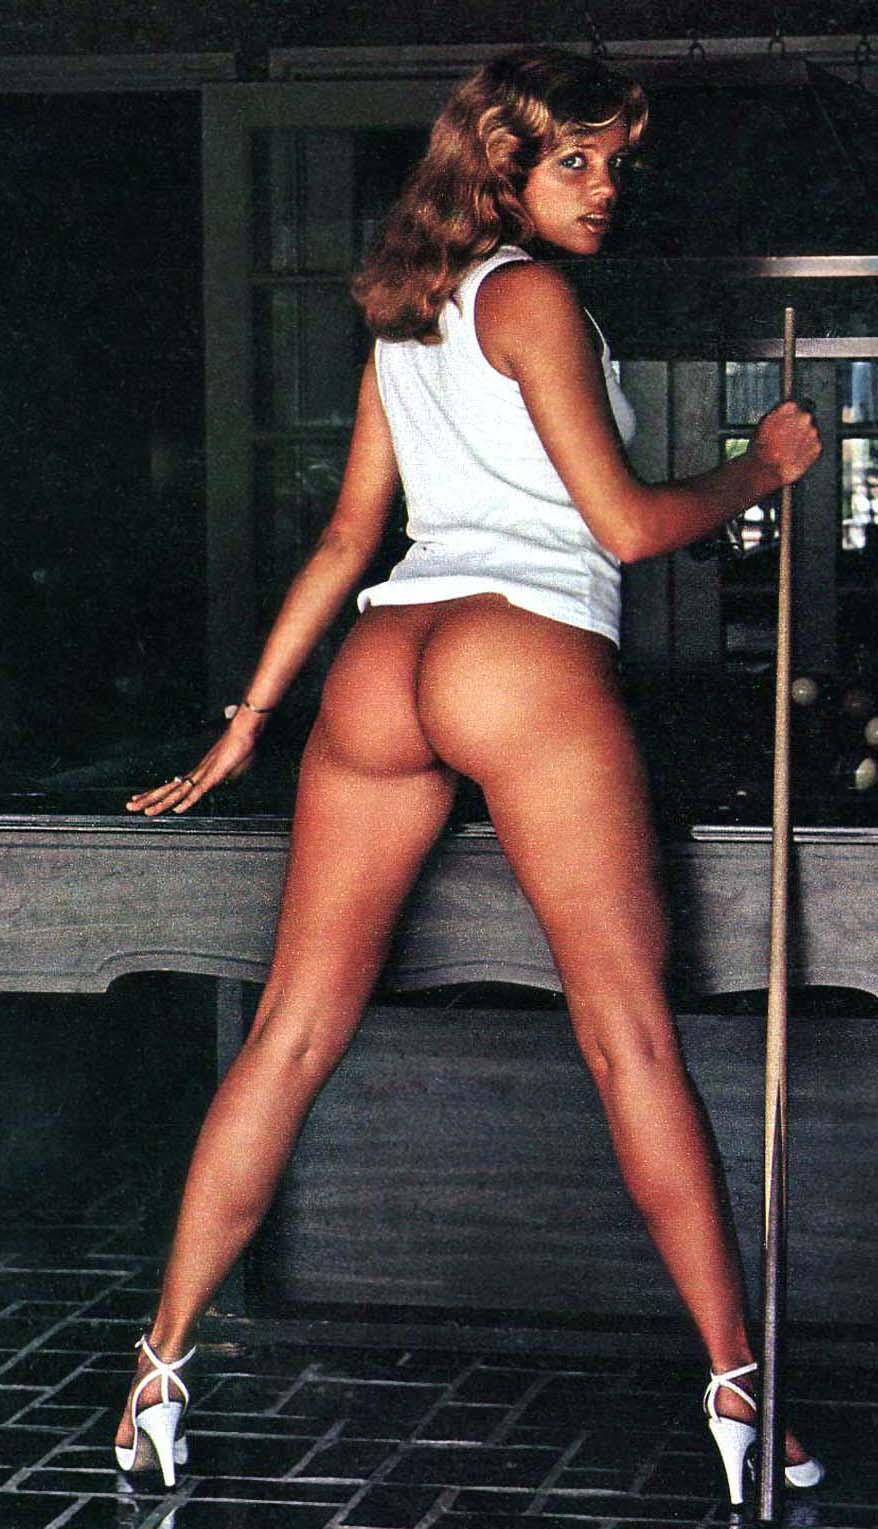 helle-kjaer-billiards